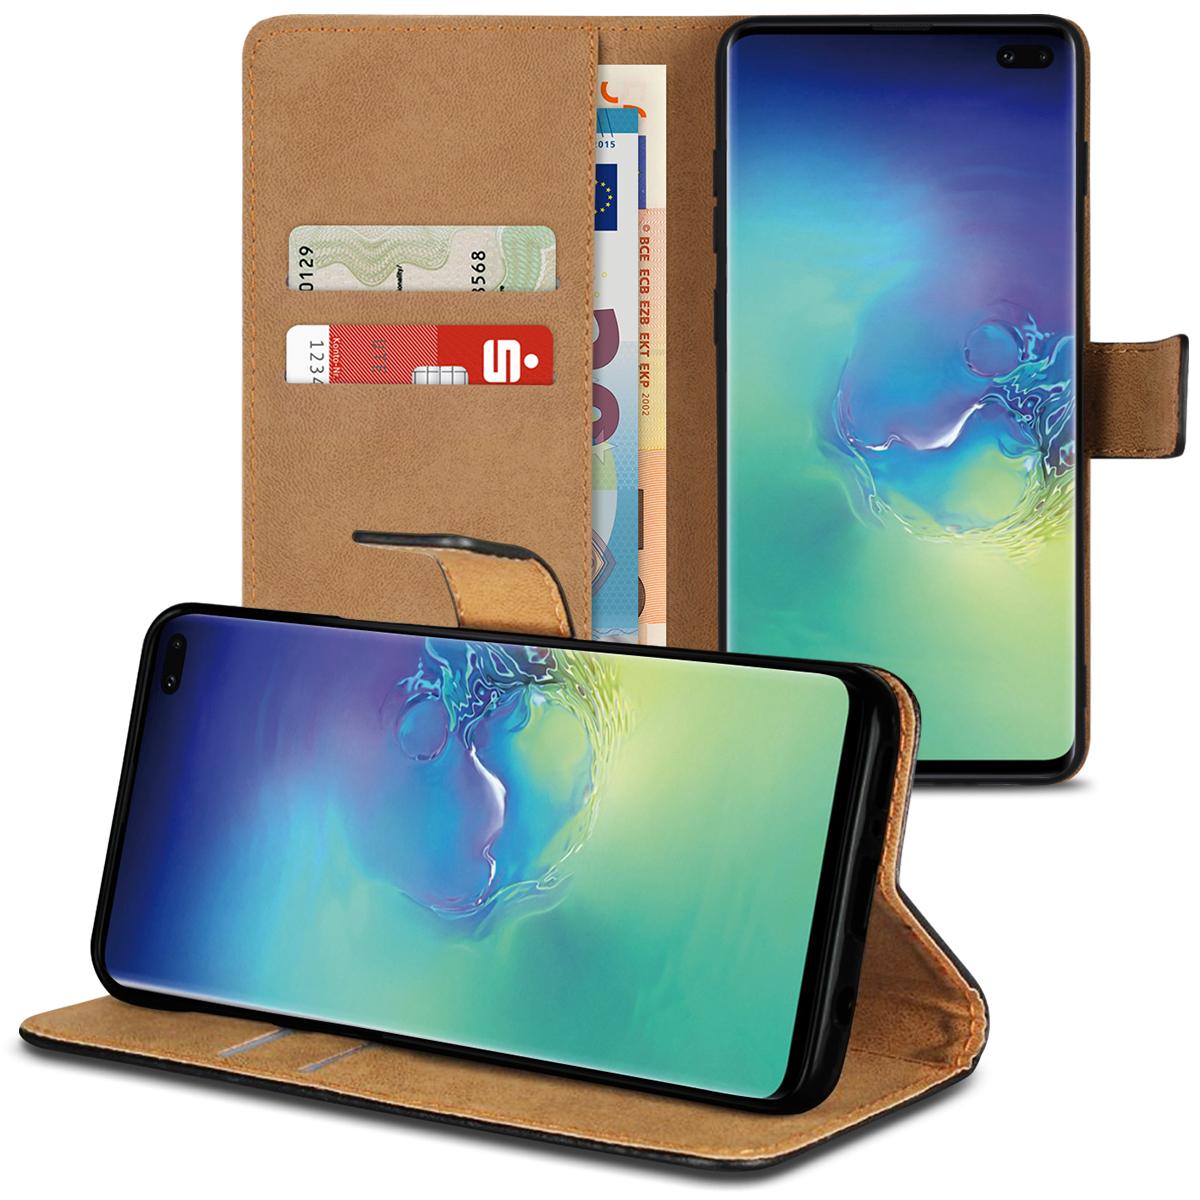 bade2dd6a50d1 Leder Hülle Samsung Galaxy S10 Plus Tasche Book Cover Handy Flip Case  Klapphülle